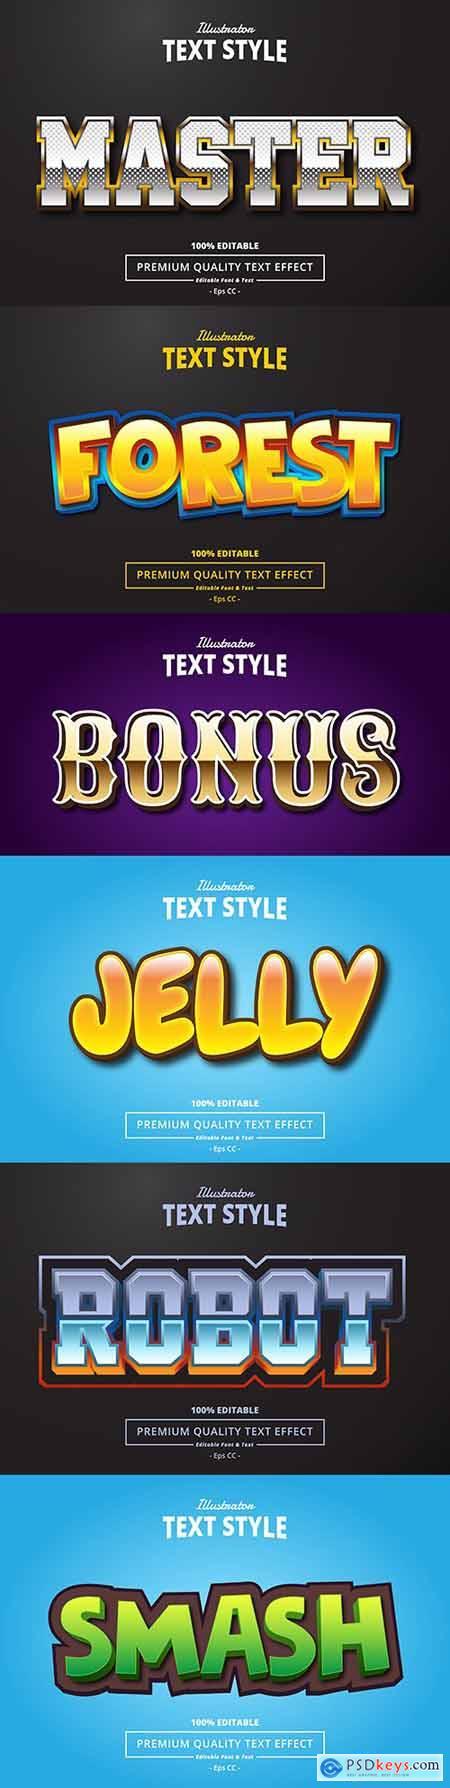 Editable font effect text collection illustration design 92